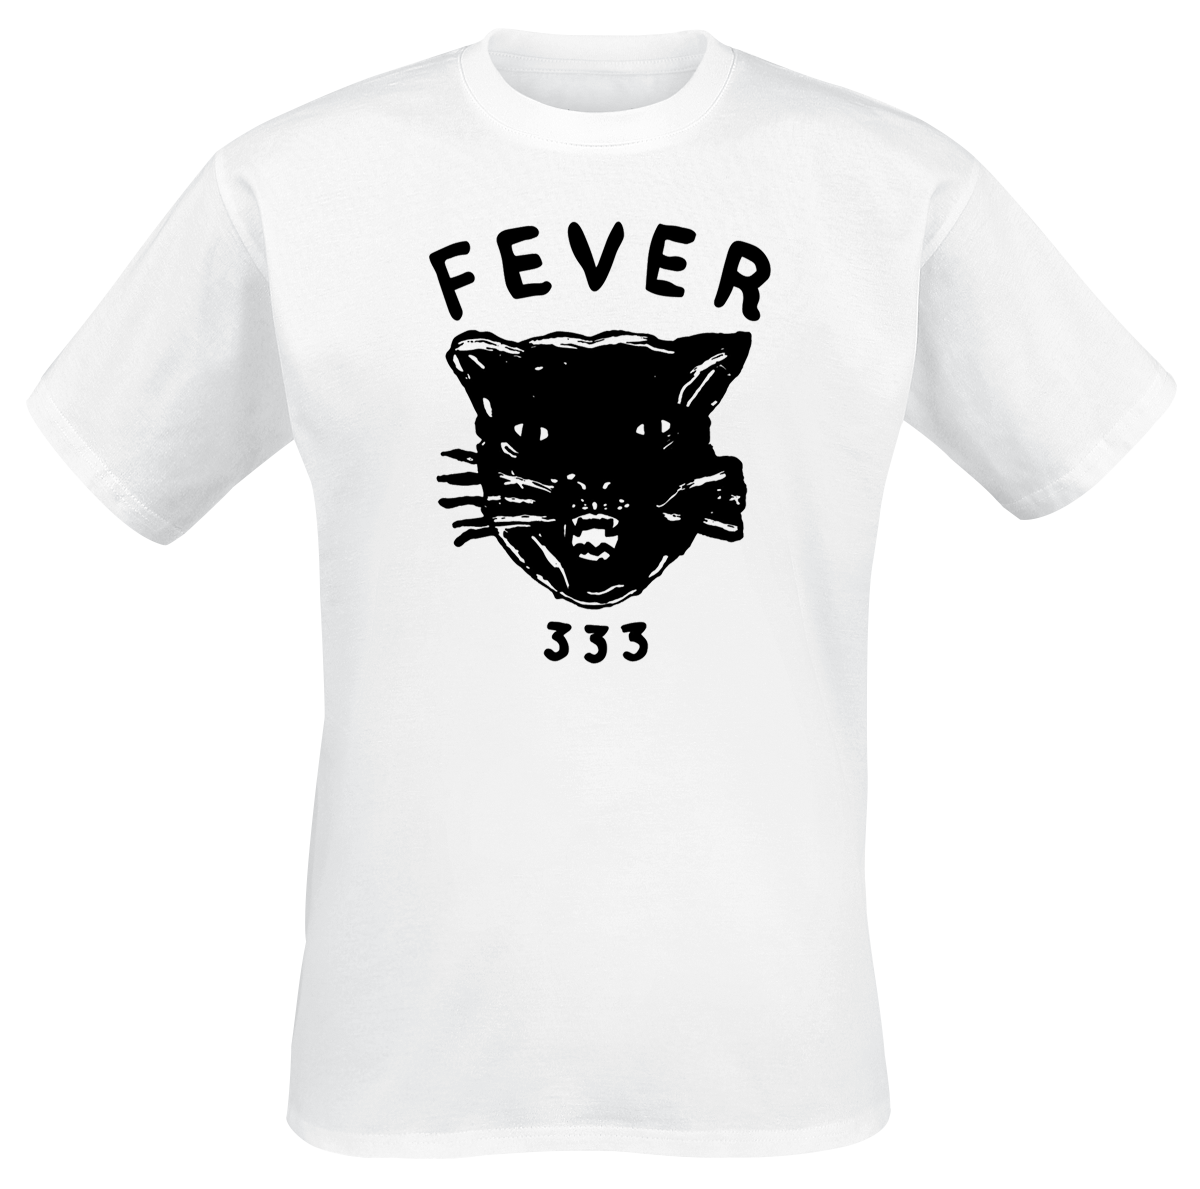 Fever 333 - Cat Mug 2019 - T-Shirt - white image